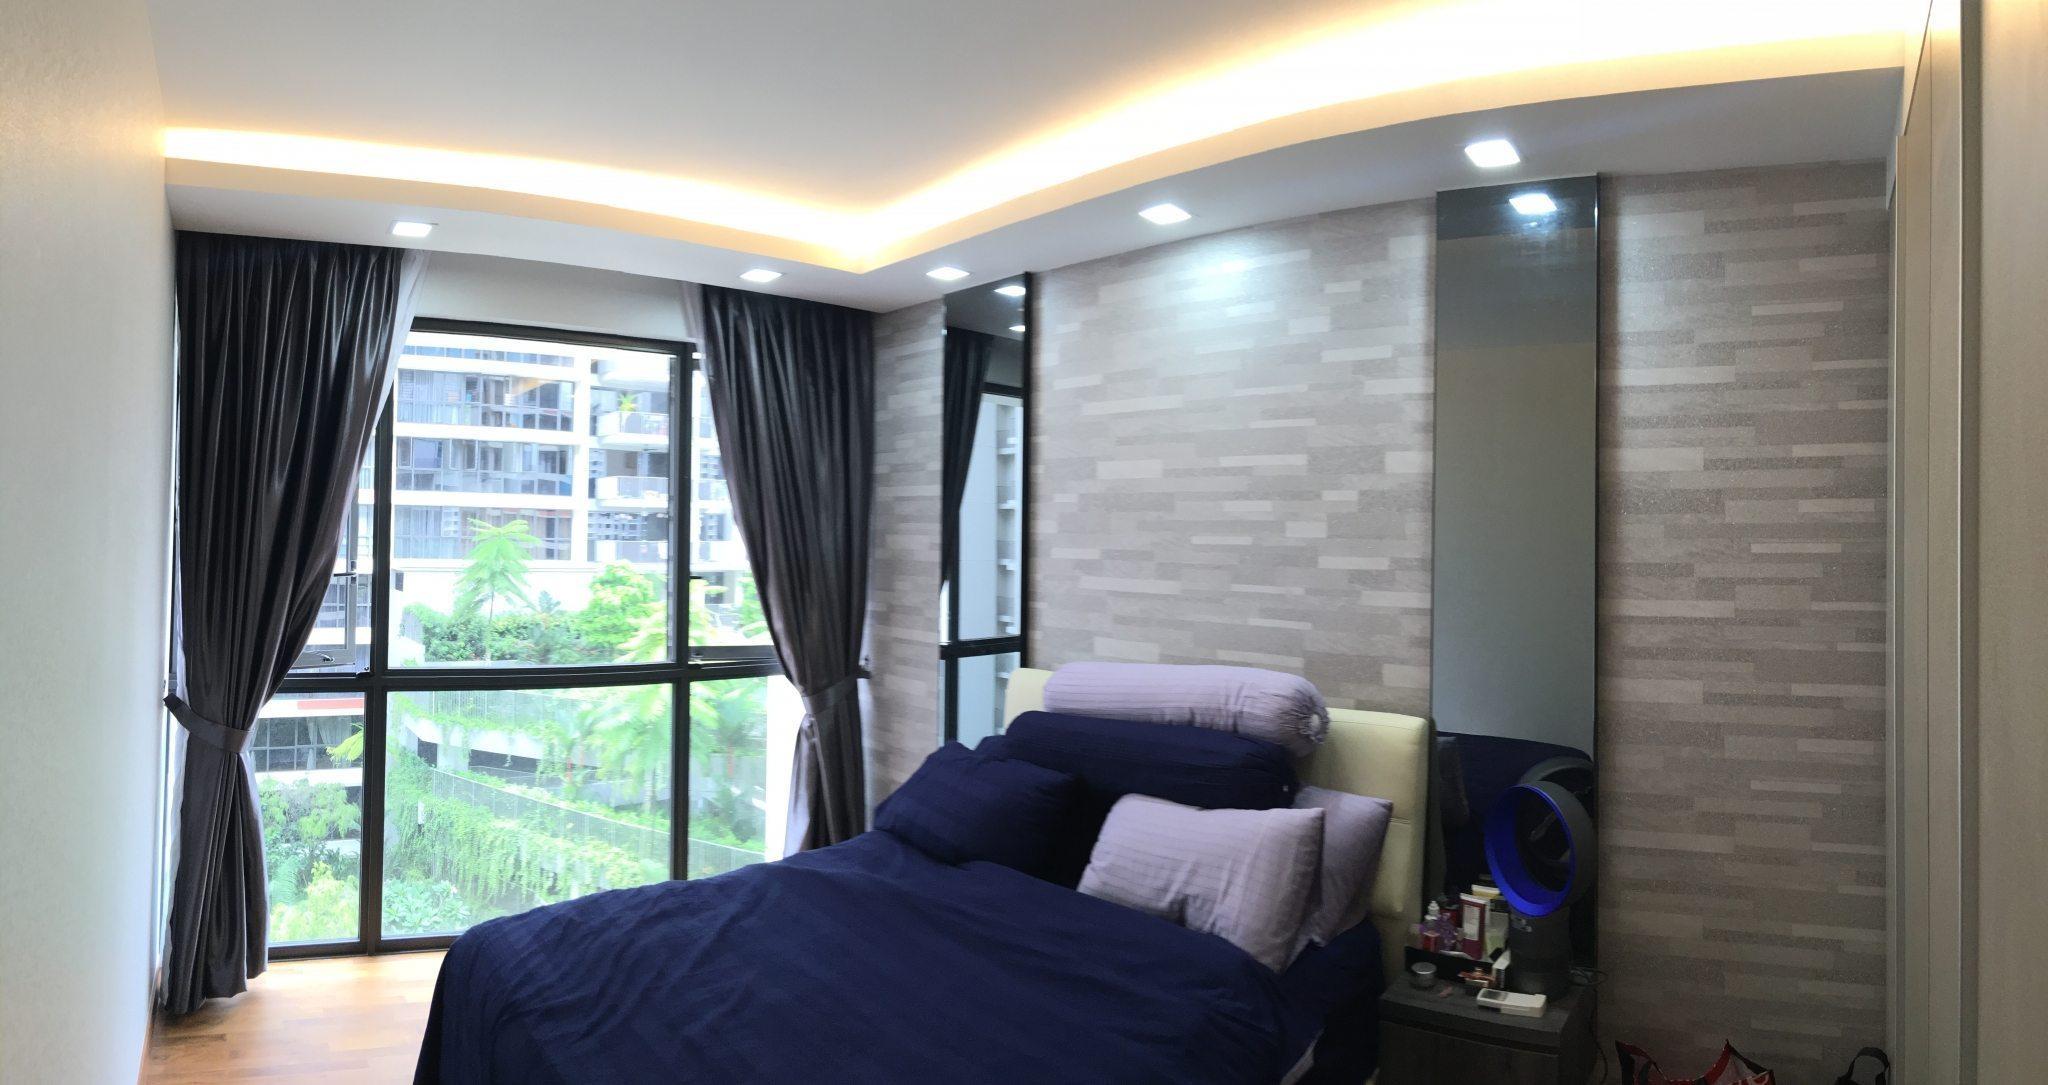 ataz haus renovation interior design company. Black Bedroom Furniture Sets. Home Design Ideas